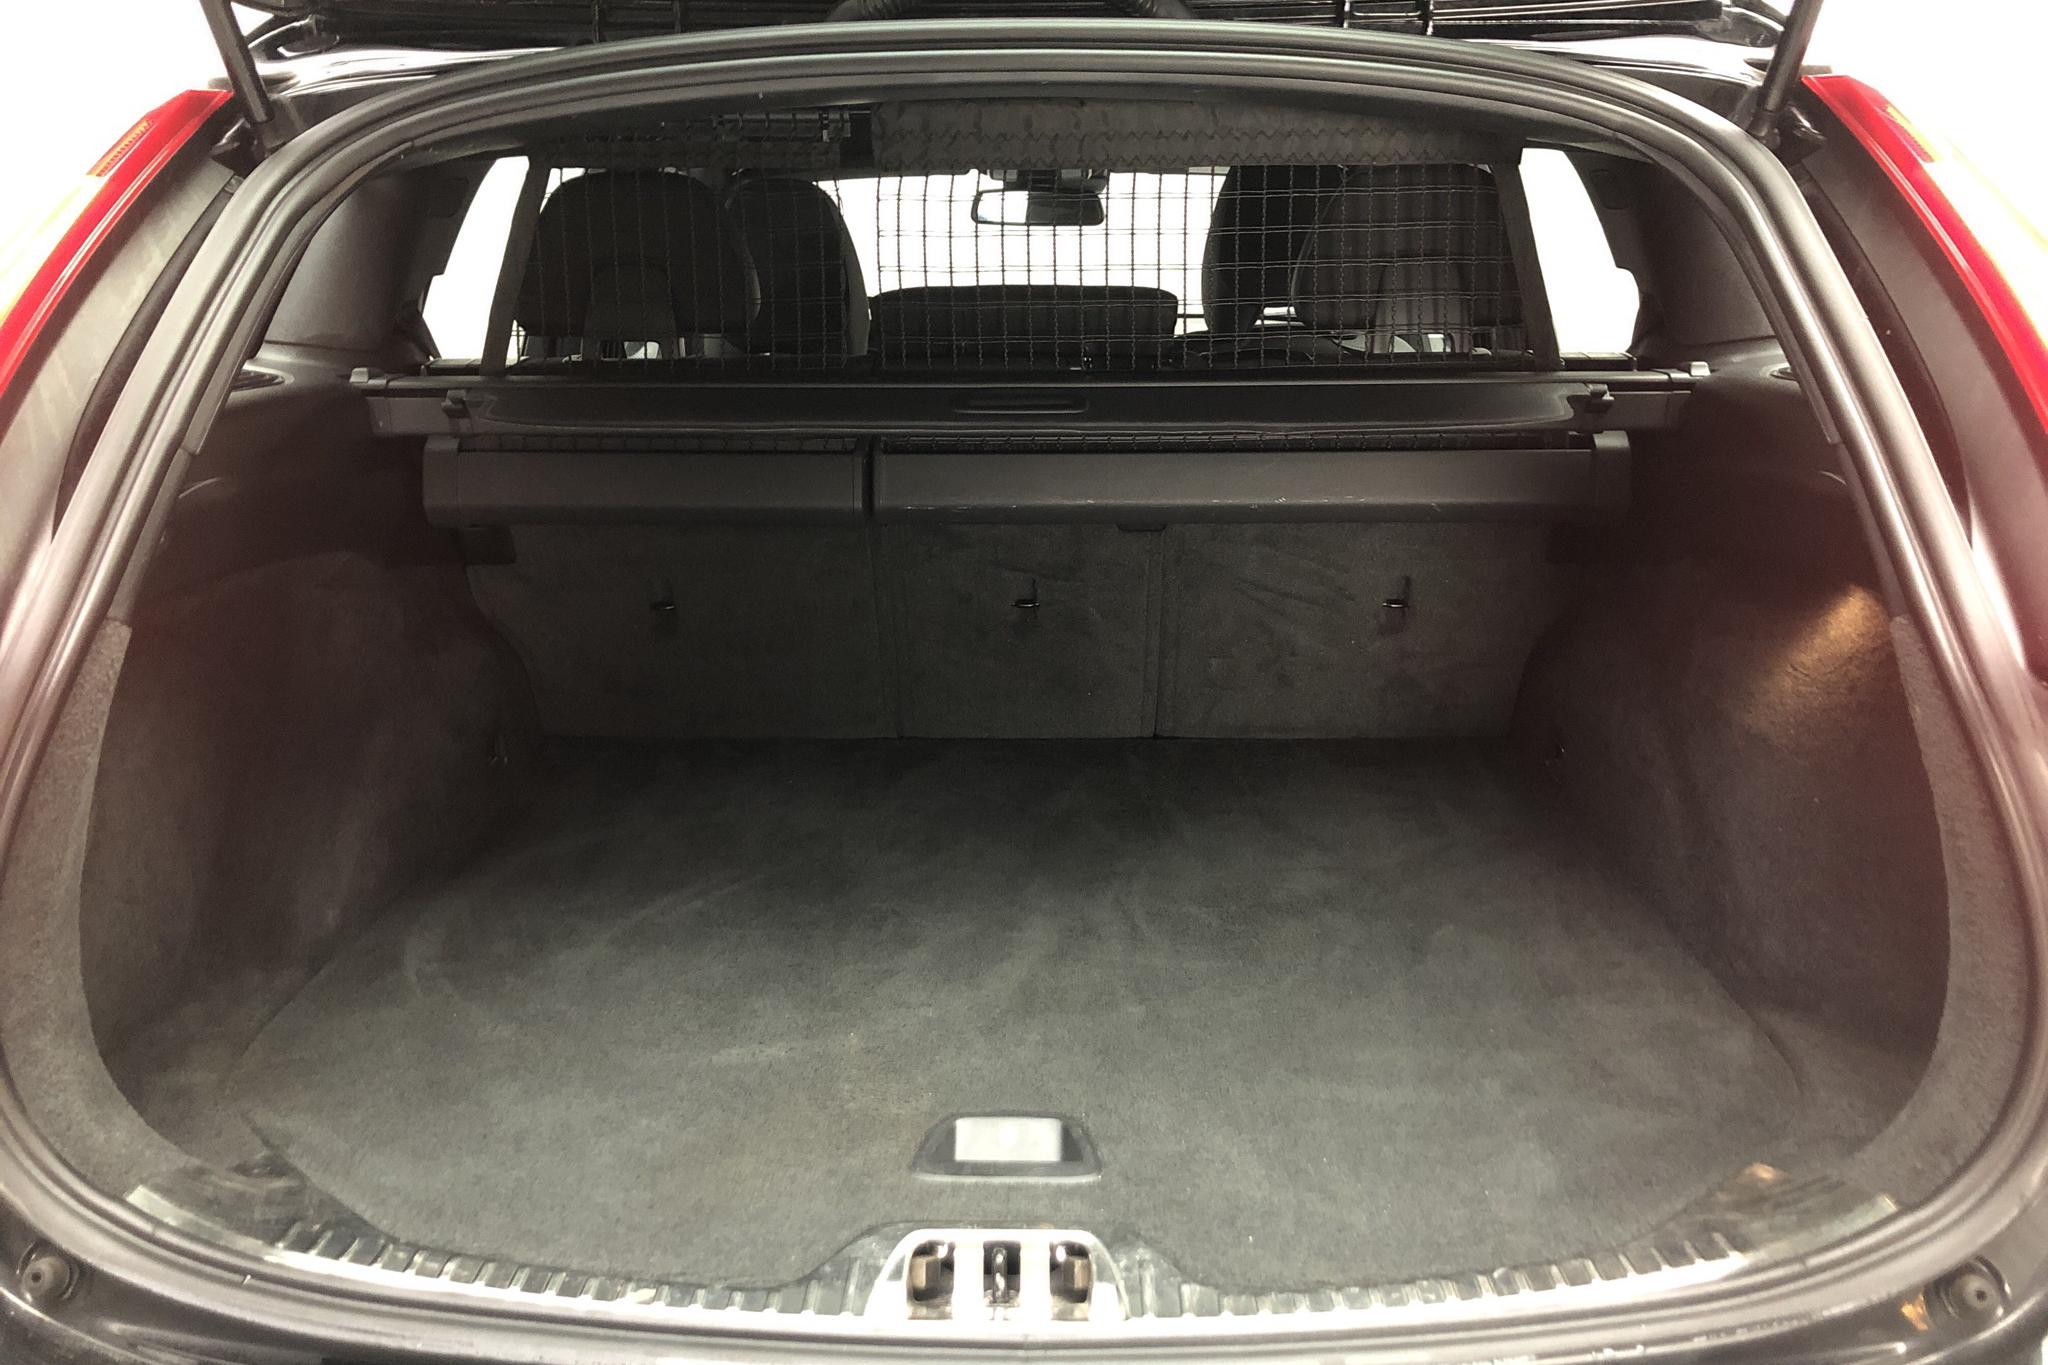 Volvo V60 D4 (181hk) - 111 940 km - Automatic - black - 2015